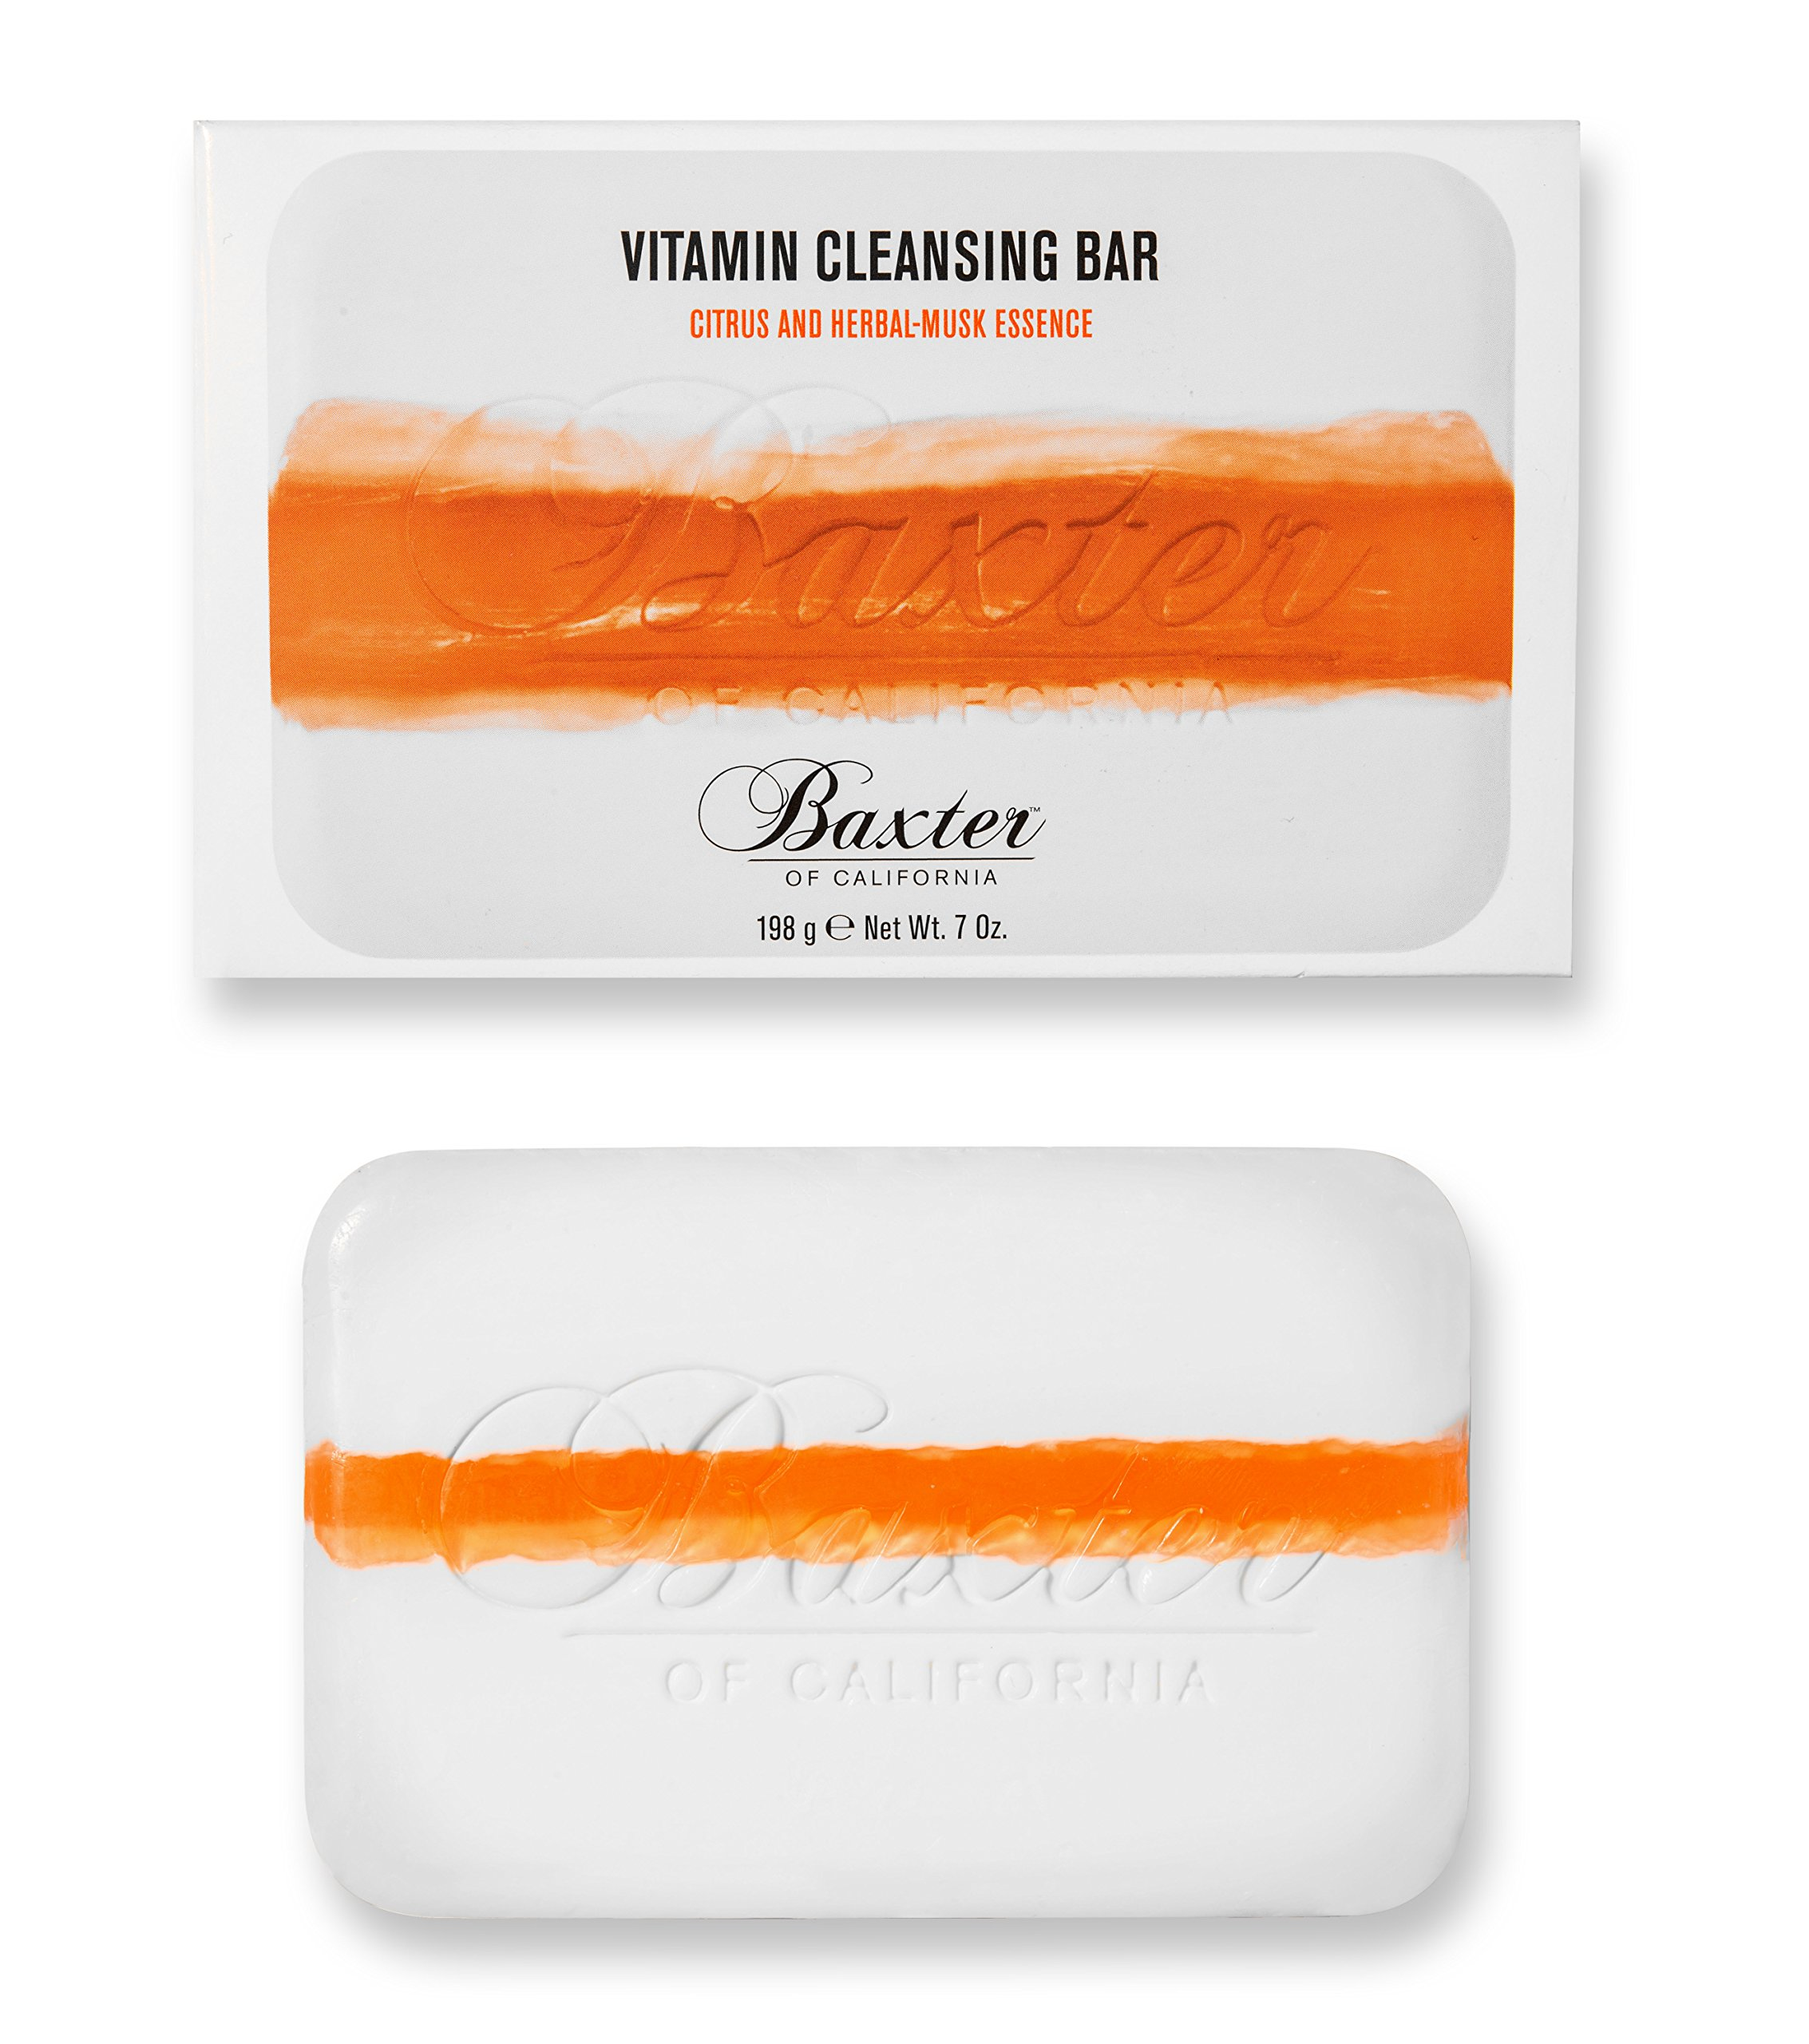 Baxter of California Vitamin Cleansing Bar,7 oz by Baxter of California